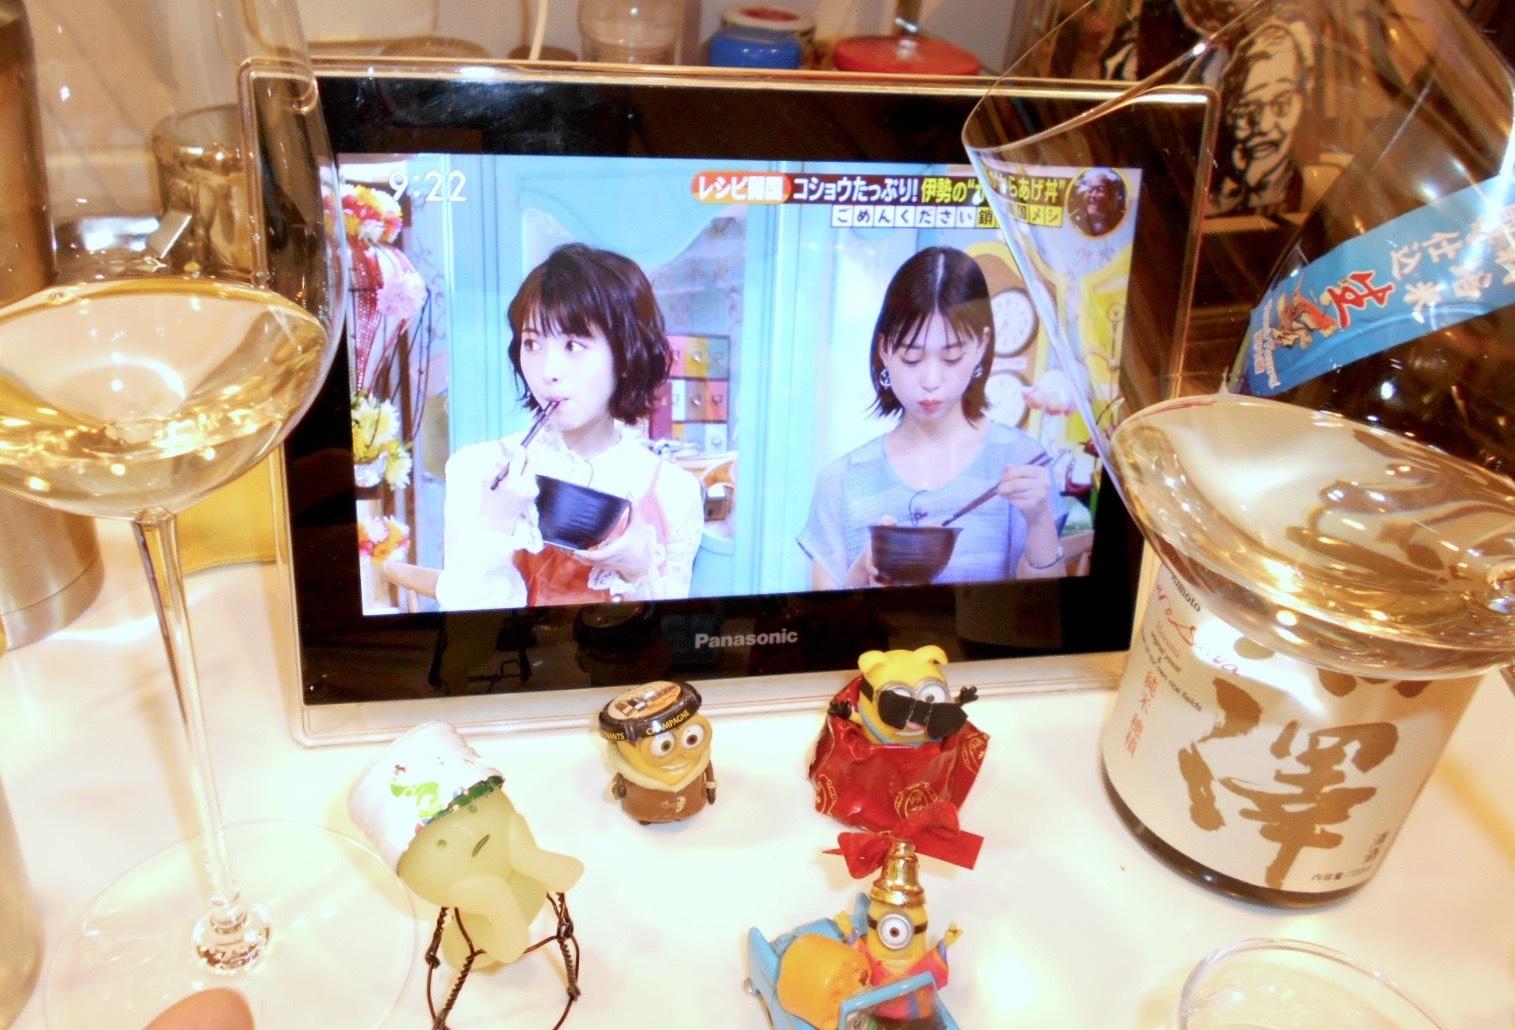 kurosawa_hozumi29by4_5.jpg